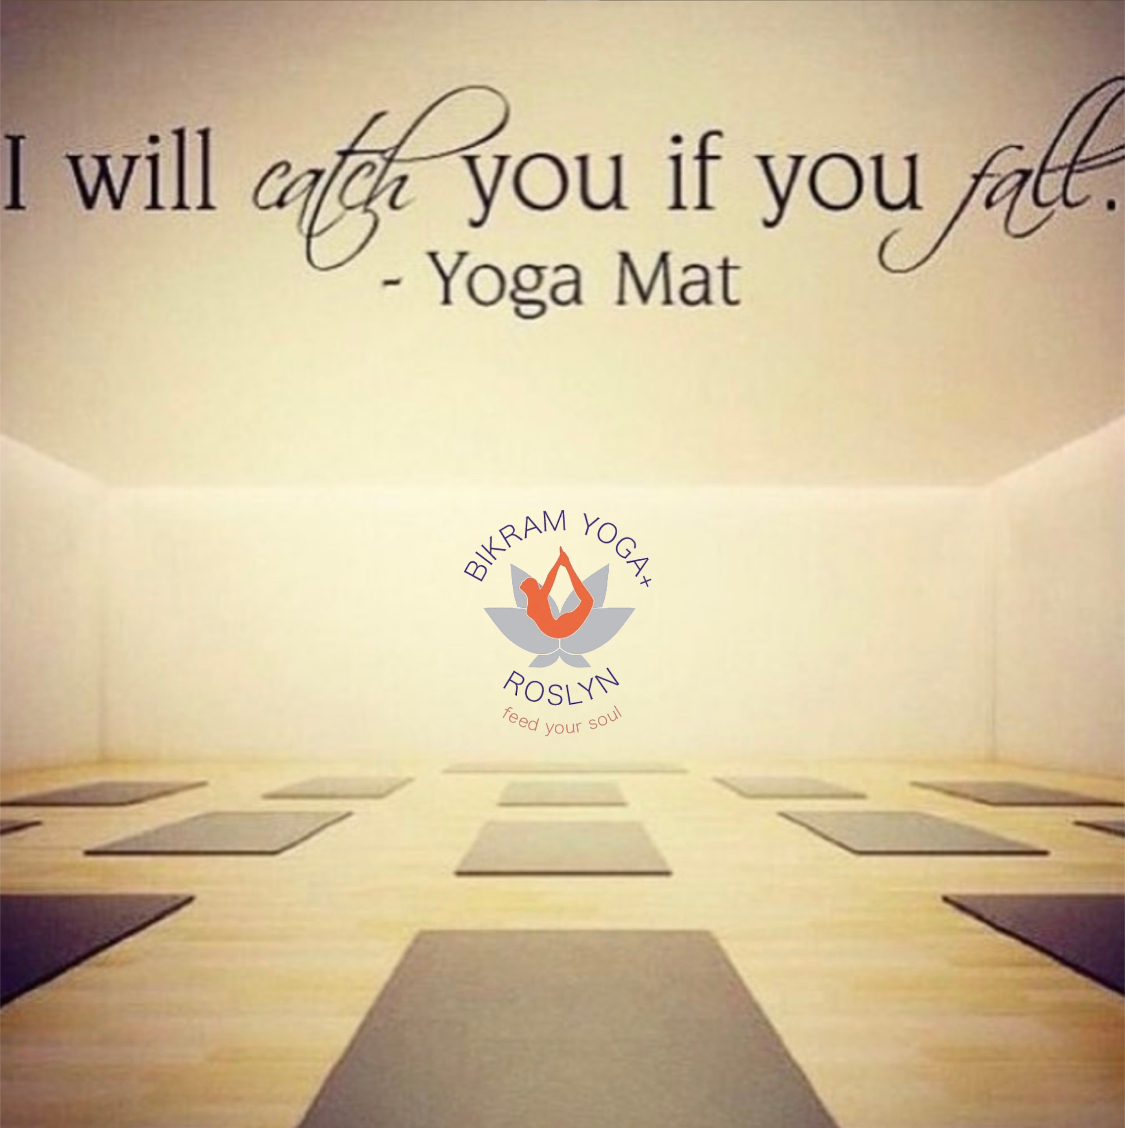 #Namaste 🙏🏻  #BYR #bikramyogaroslyn #yoga+ #notjustbikram #soul #sweatfactory #hotyoga #CBD #bikram #yoga #ashtanga #athleticwear #yogis #mat #longislandyogis #health #wellness #fitness #HIIT #breathe #roslynyoga #yogalife #yogalove #practiceyoga #yogaclass #yinandsound